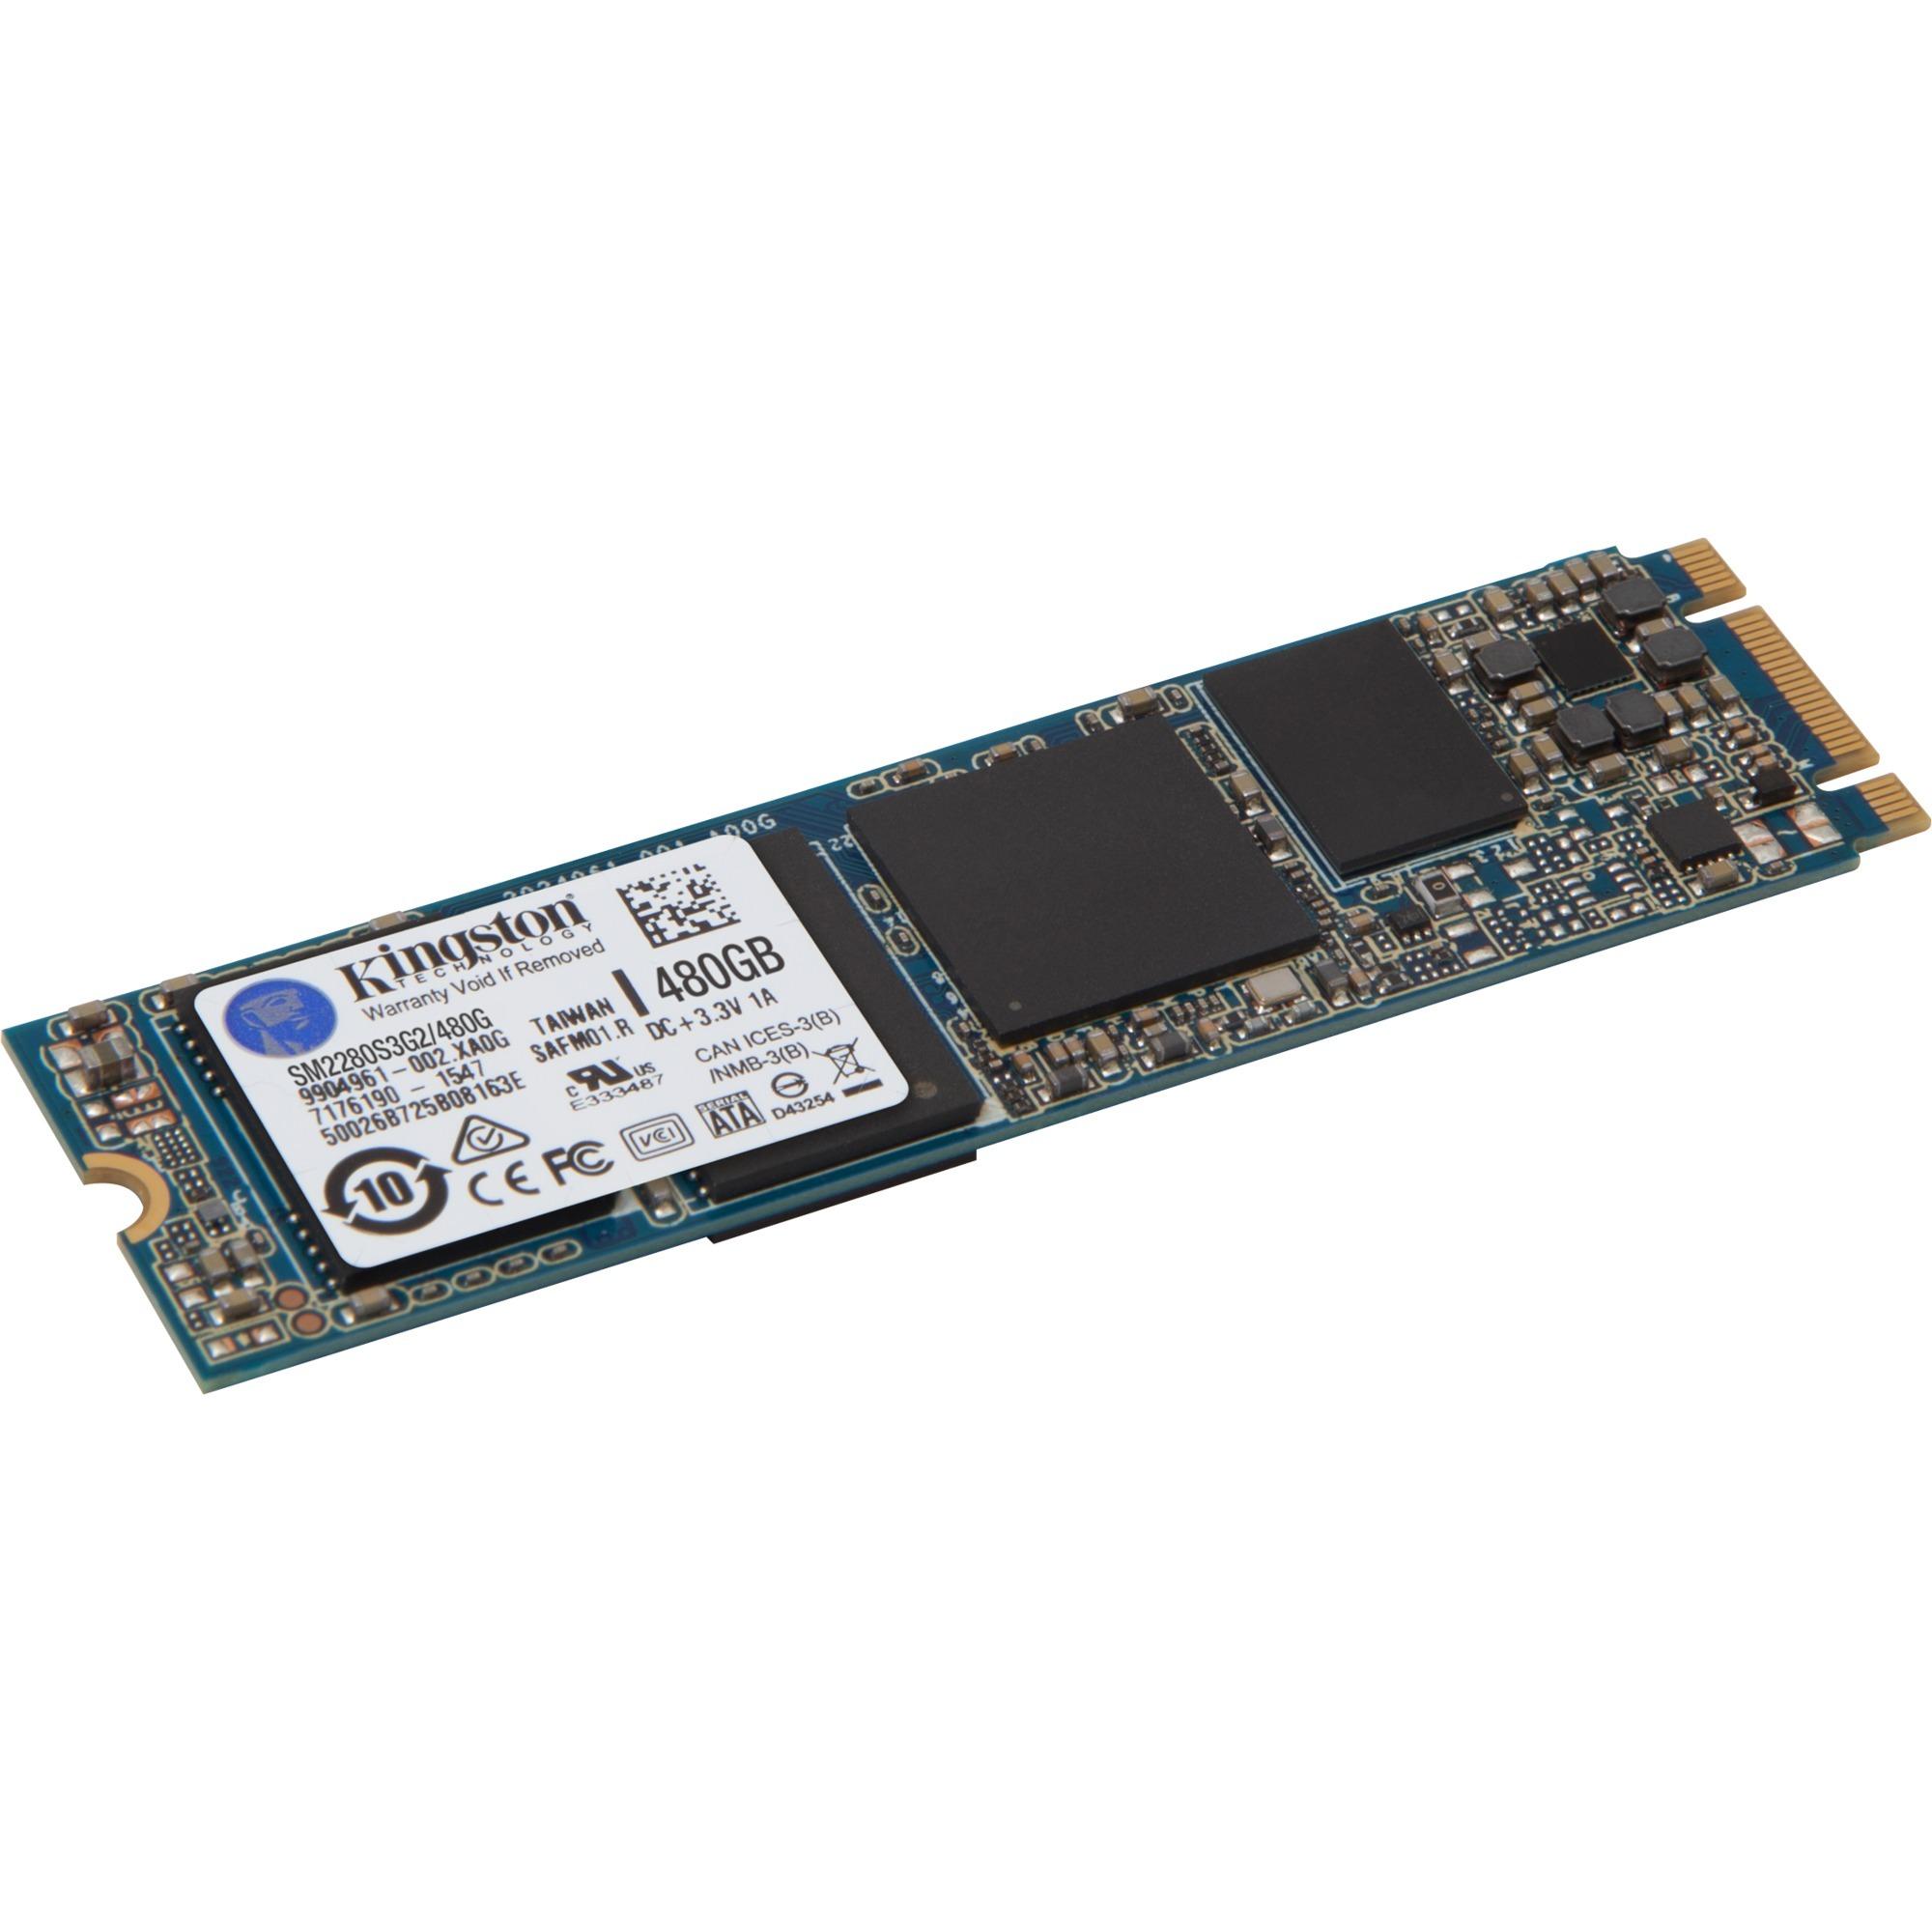 SSDNow M.2 SATA G2 Drive 480GB 480Go Série ATA III